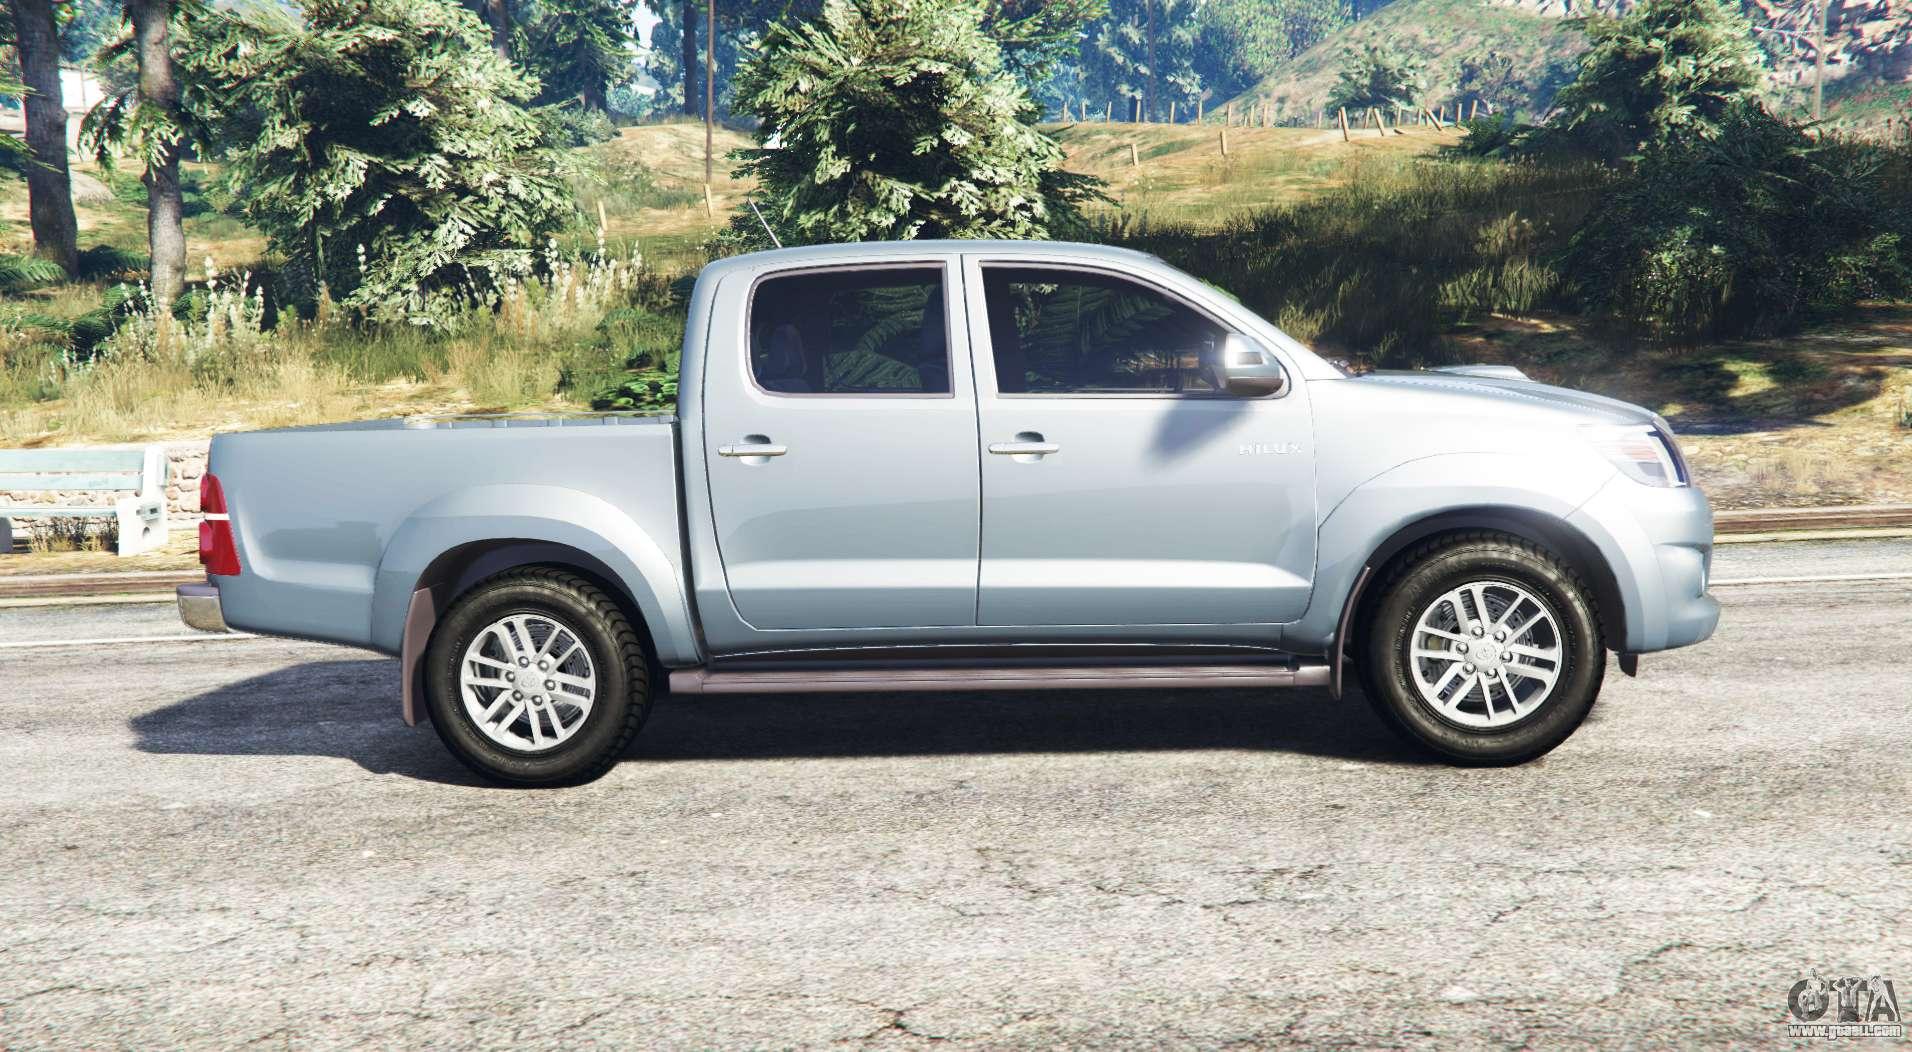 Bravado Bison Gta 5 Toyota Hilux Double Ca...